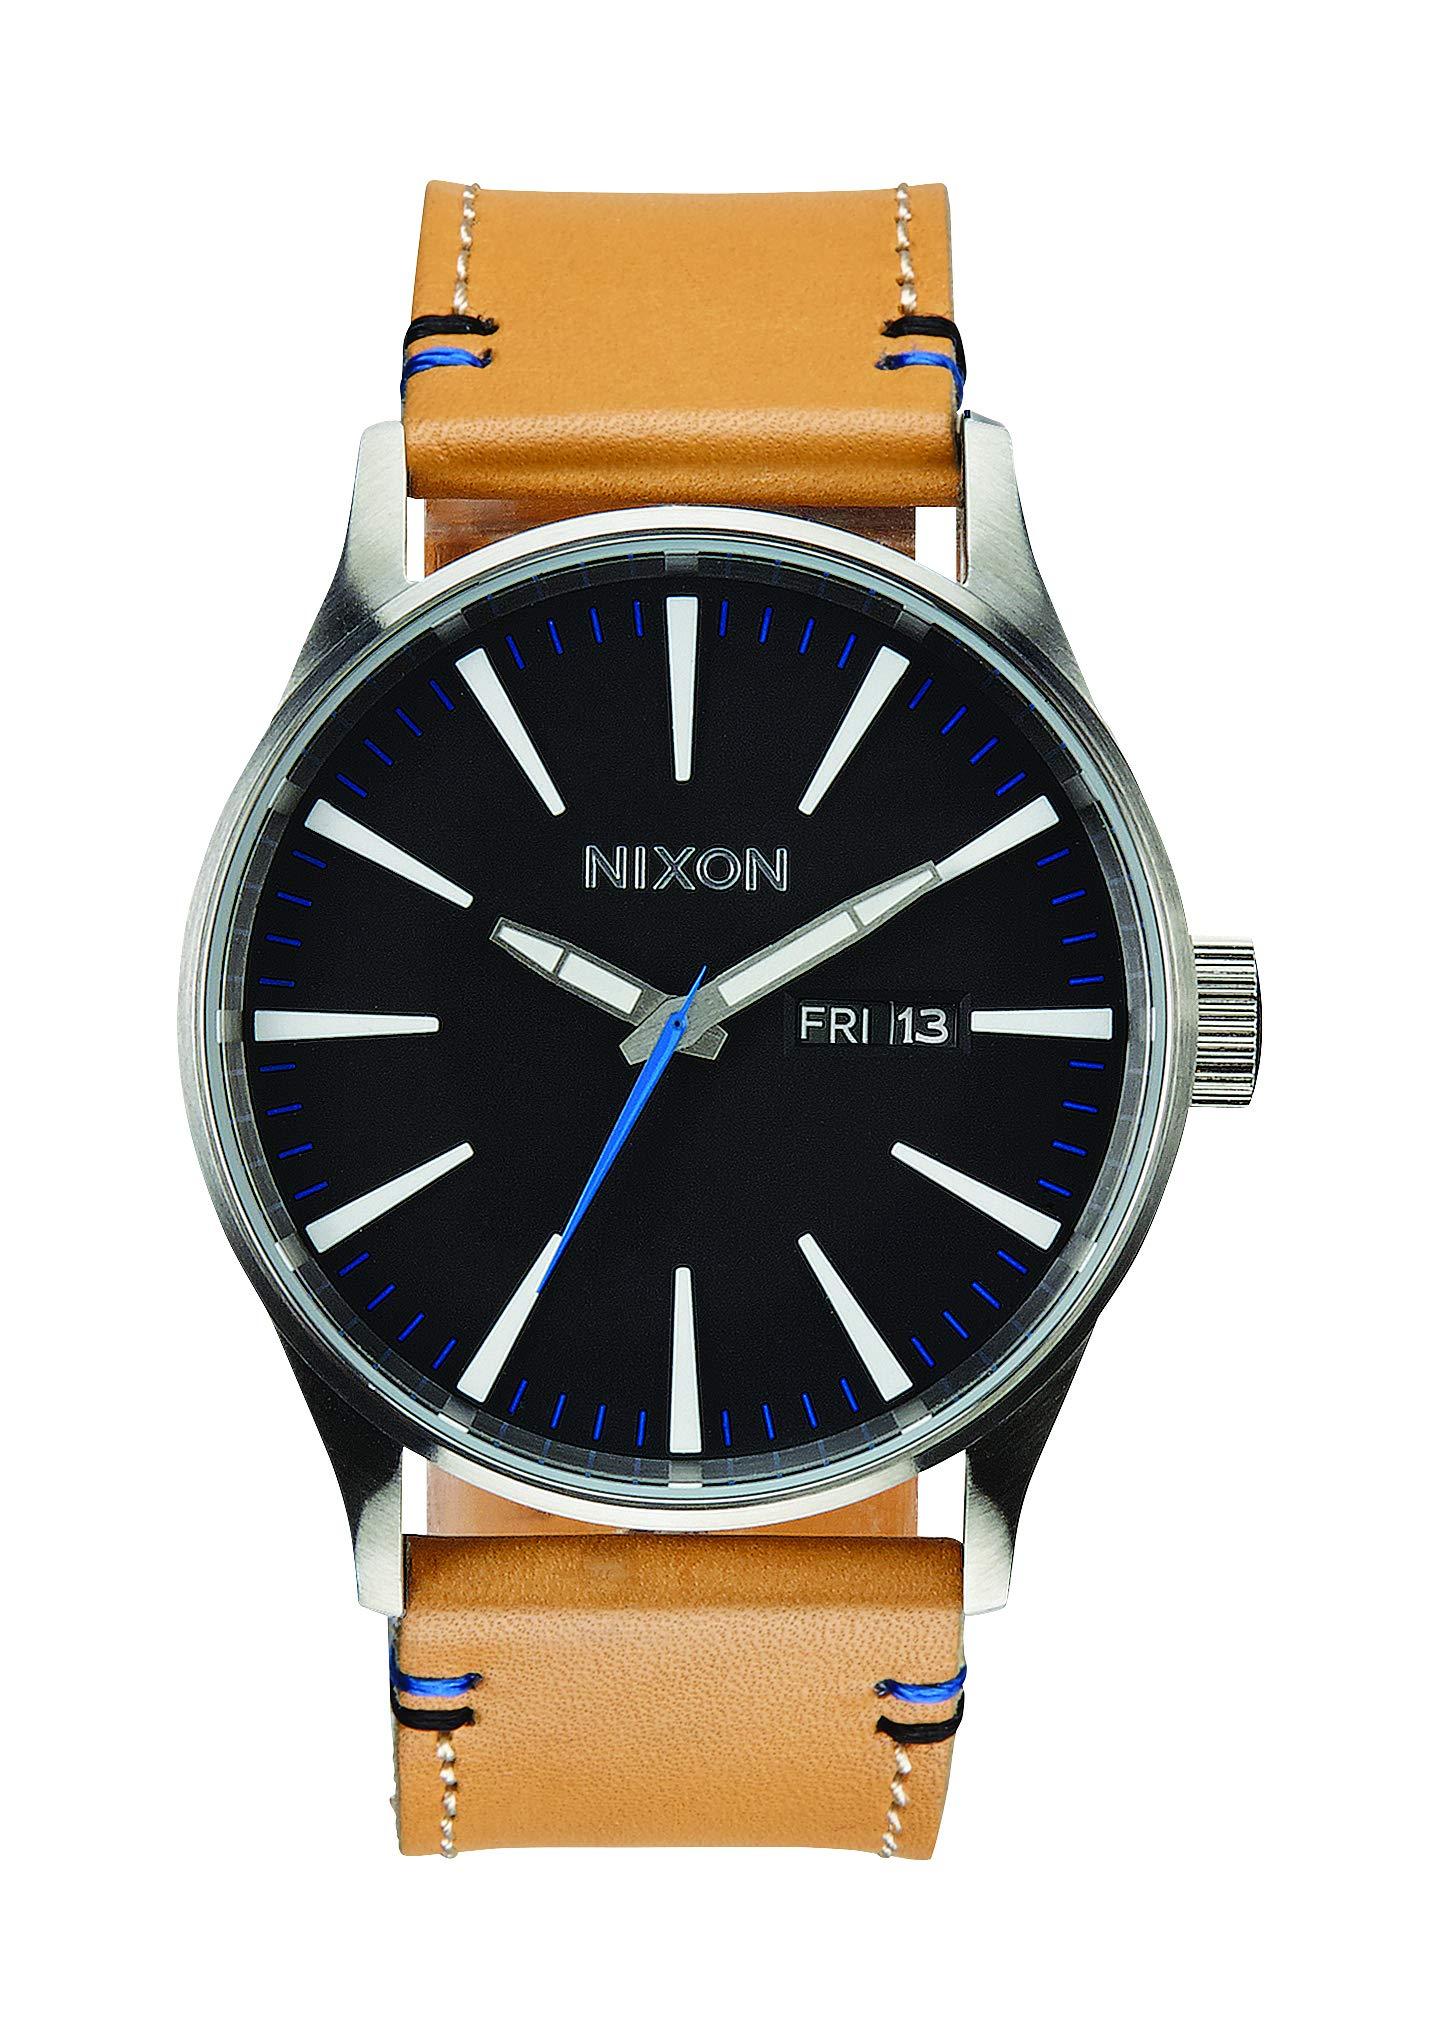 Herren Analog Quarz Uhr mit Leder Armband A1051602-00